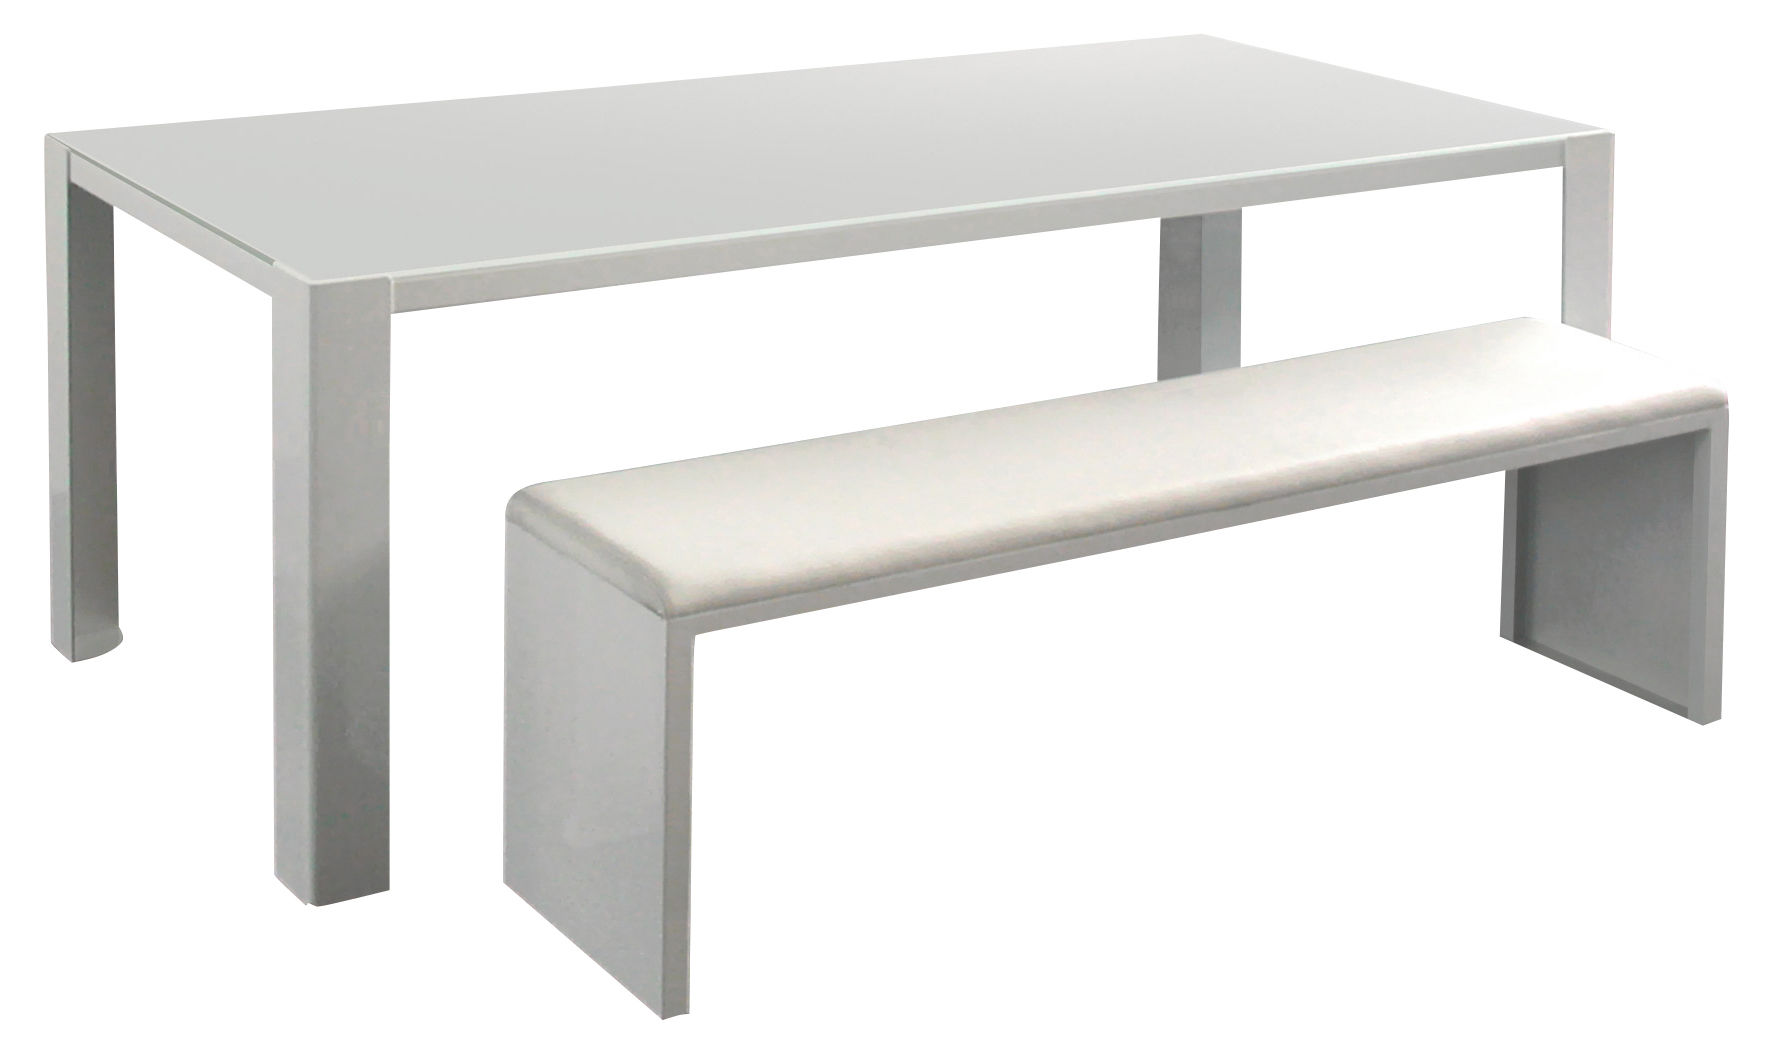 Irony Pad Bench White 160 x 36 cm by Zeus